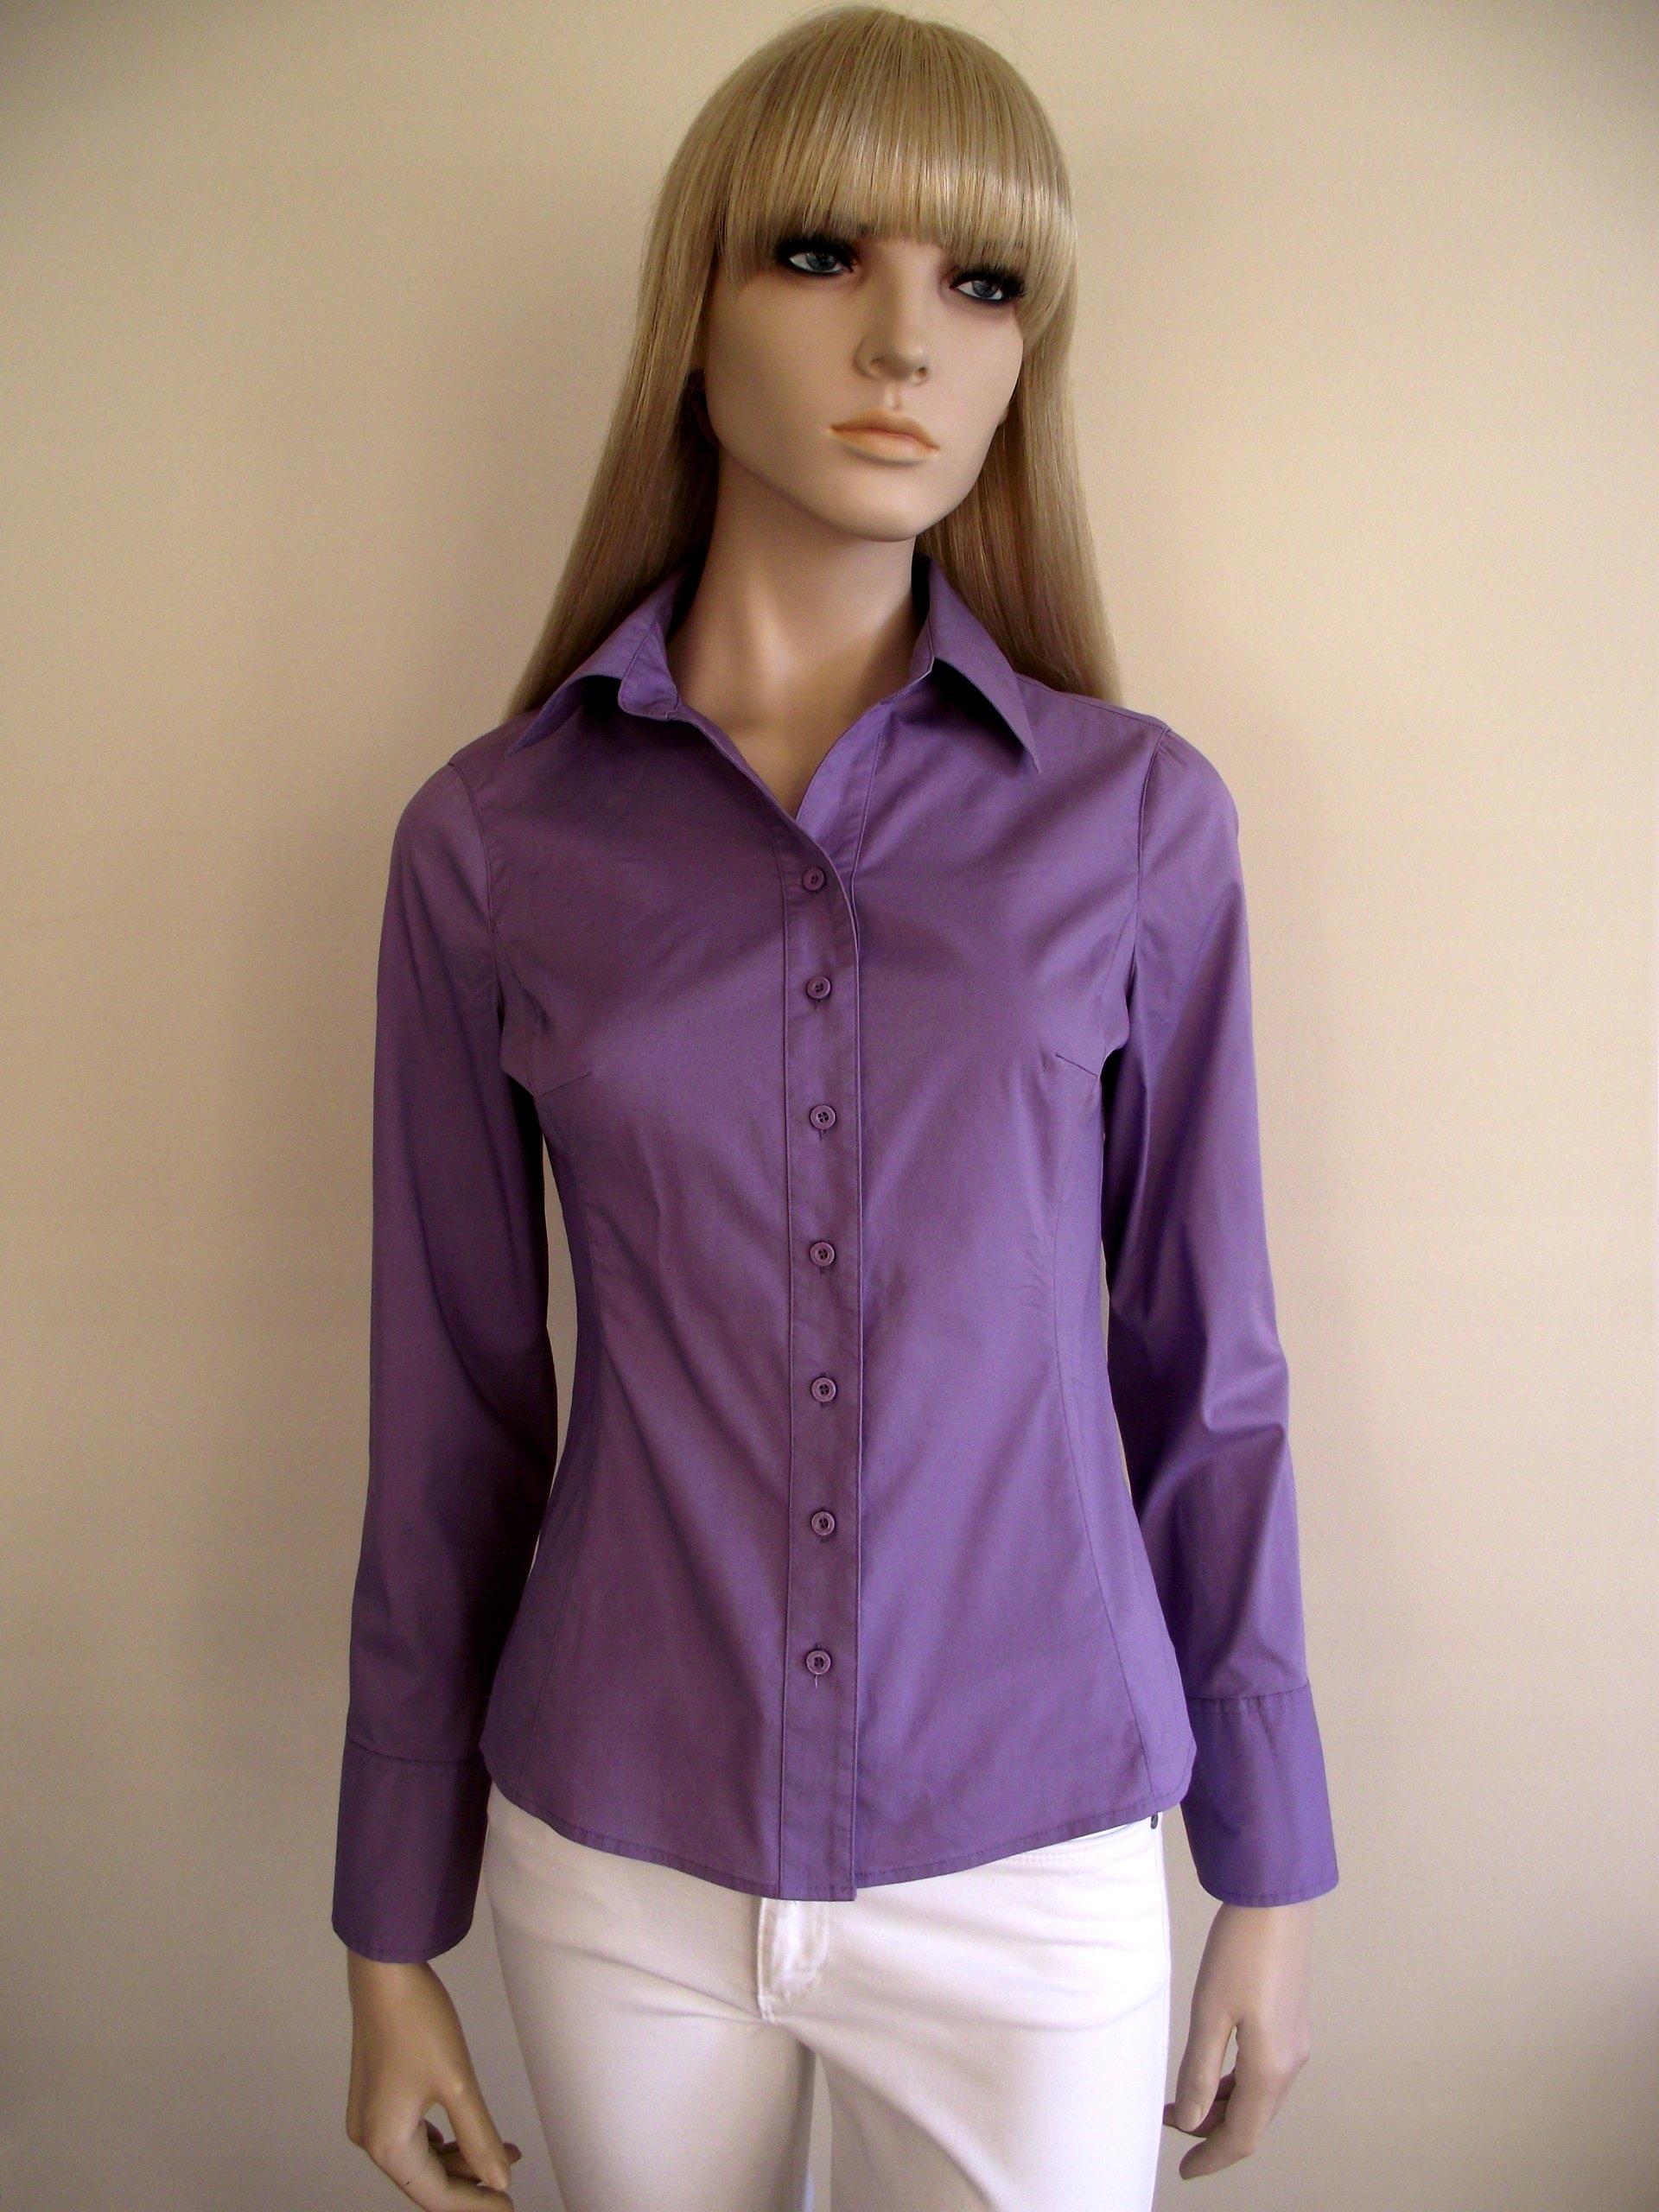 683e4c8a316abb Street One damska koszula z długim rękawem S/M - 7148918909 ...